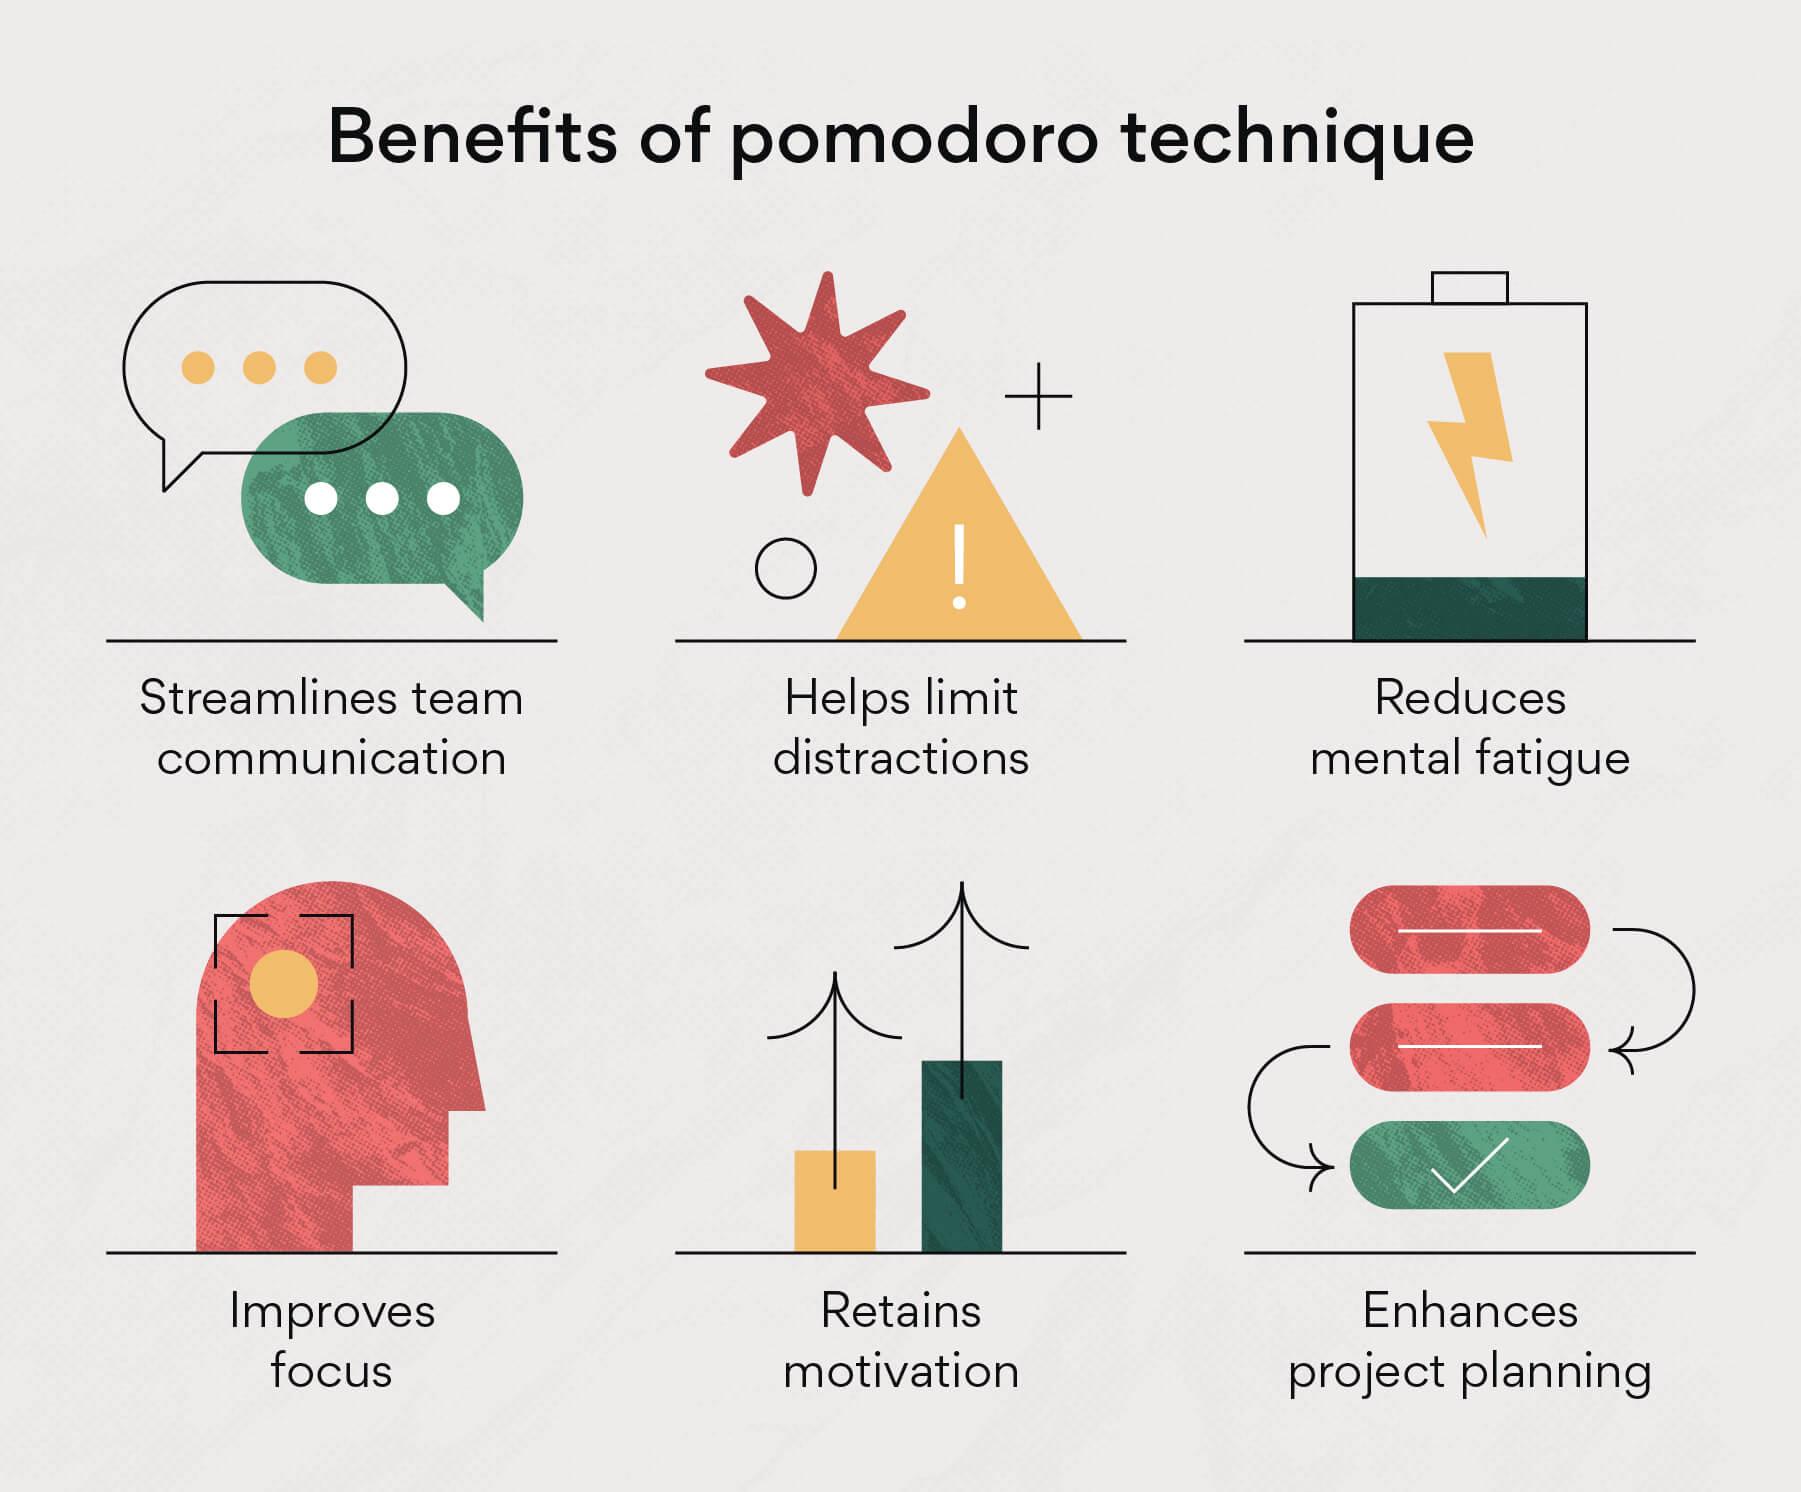 Benefits of the pomodoro technique